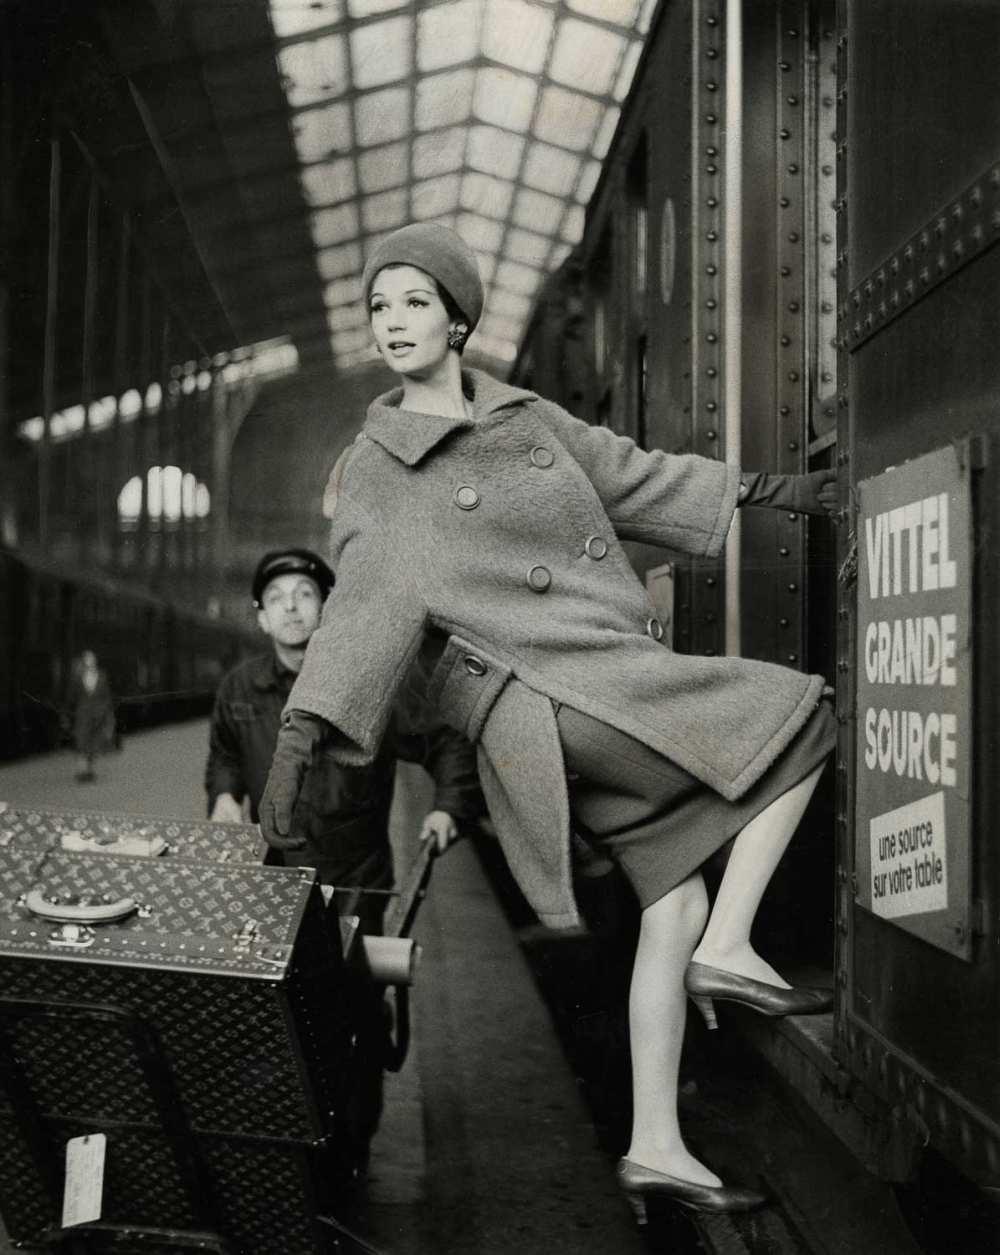 © Estate of Louis Faurer, Model hanging out of Train Car, Paris, 1960